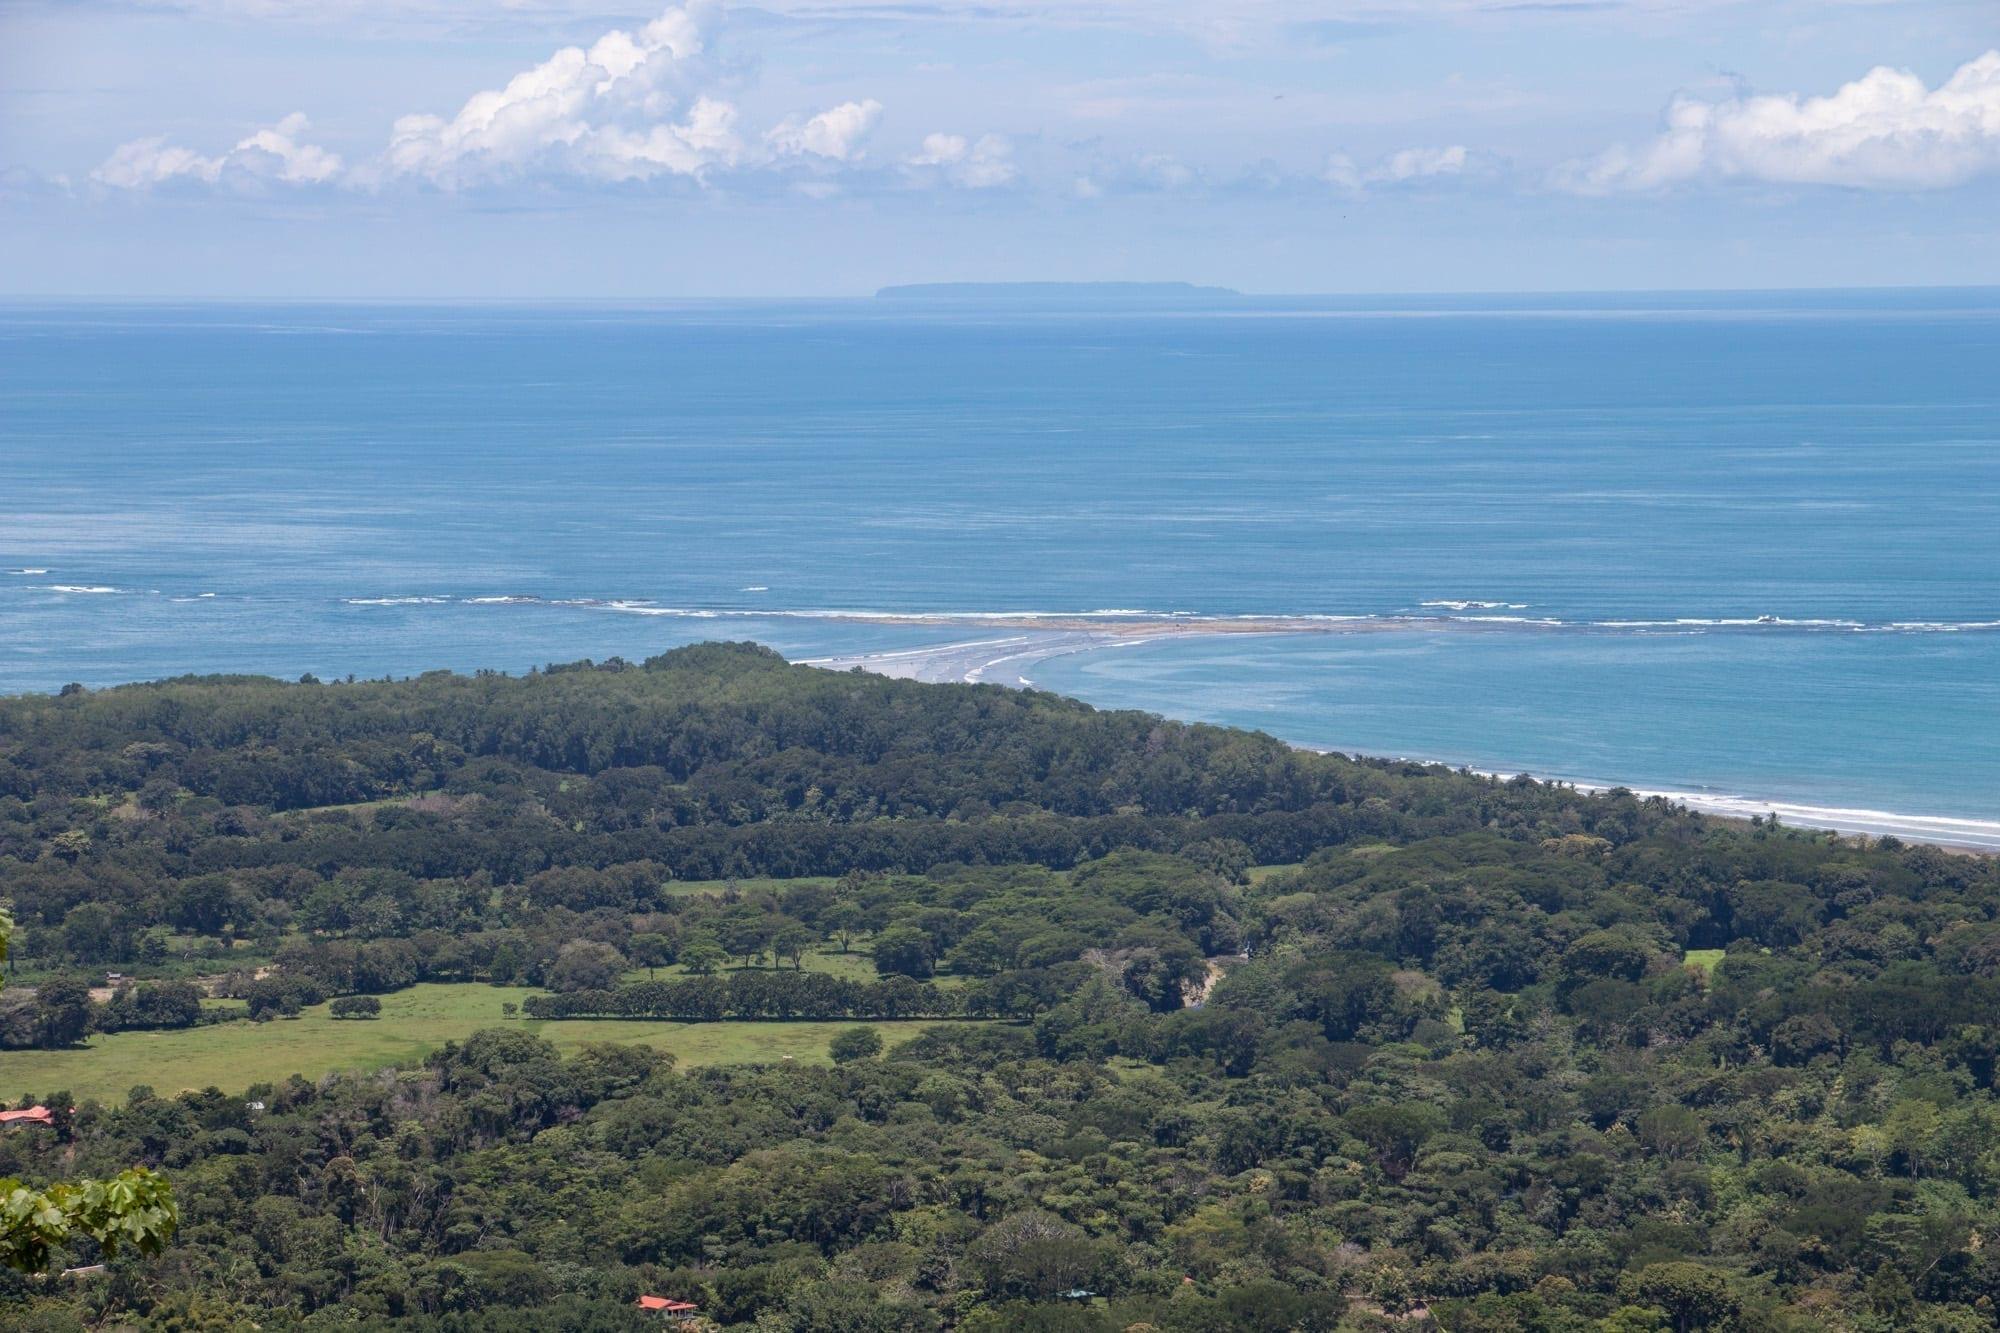 0.25 ACRES - 6 Bedroom Ocean View Home With Pool And Manuel Antonio Park Views!!!